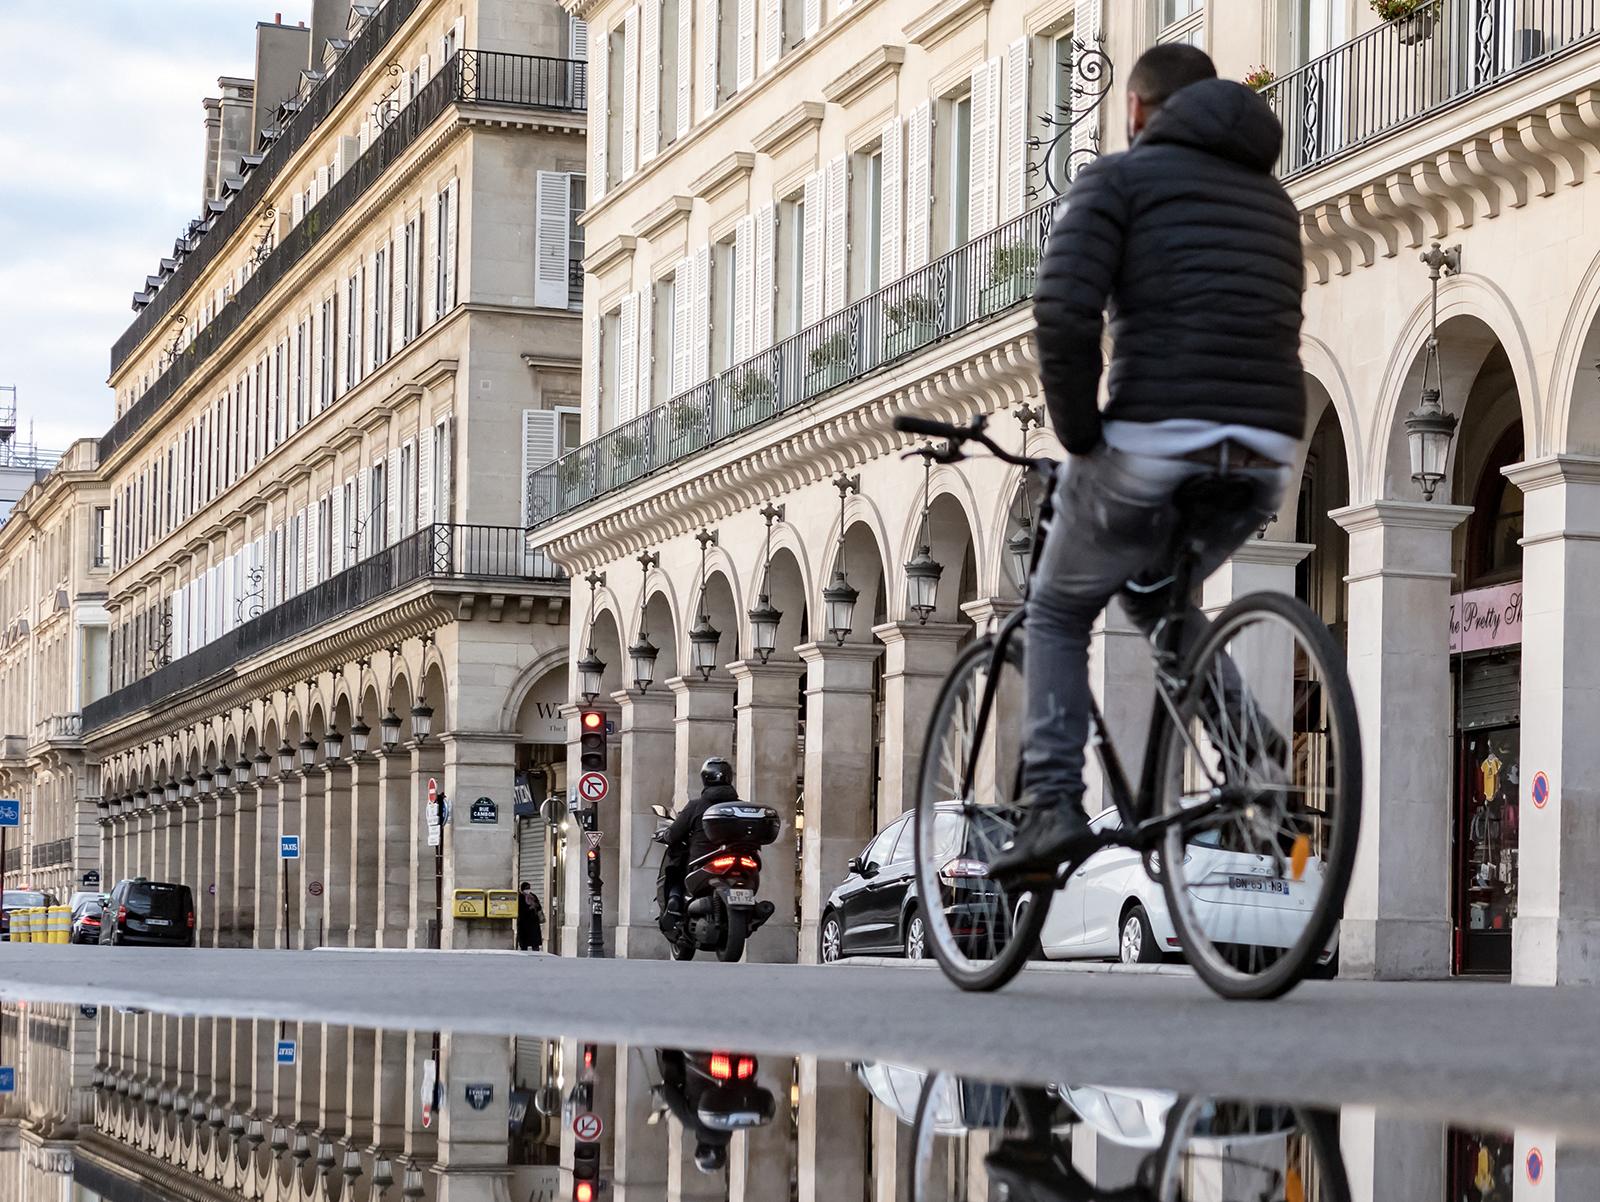 A cyclist rides on the Rue de Rivoli in Paris on November 23.